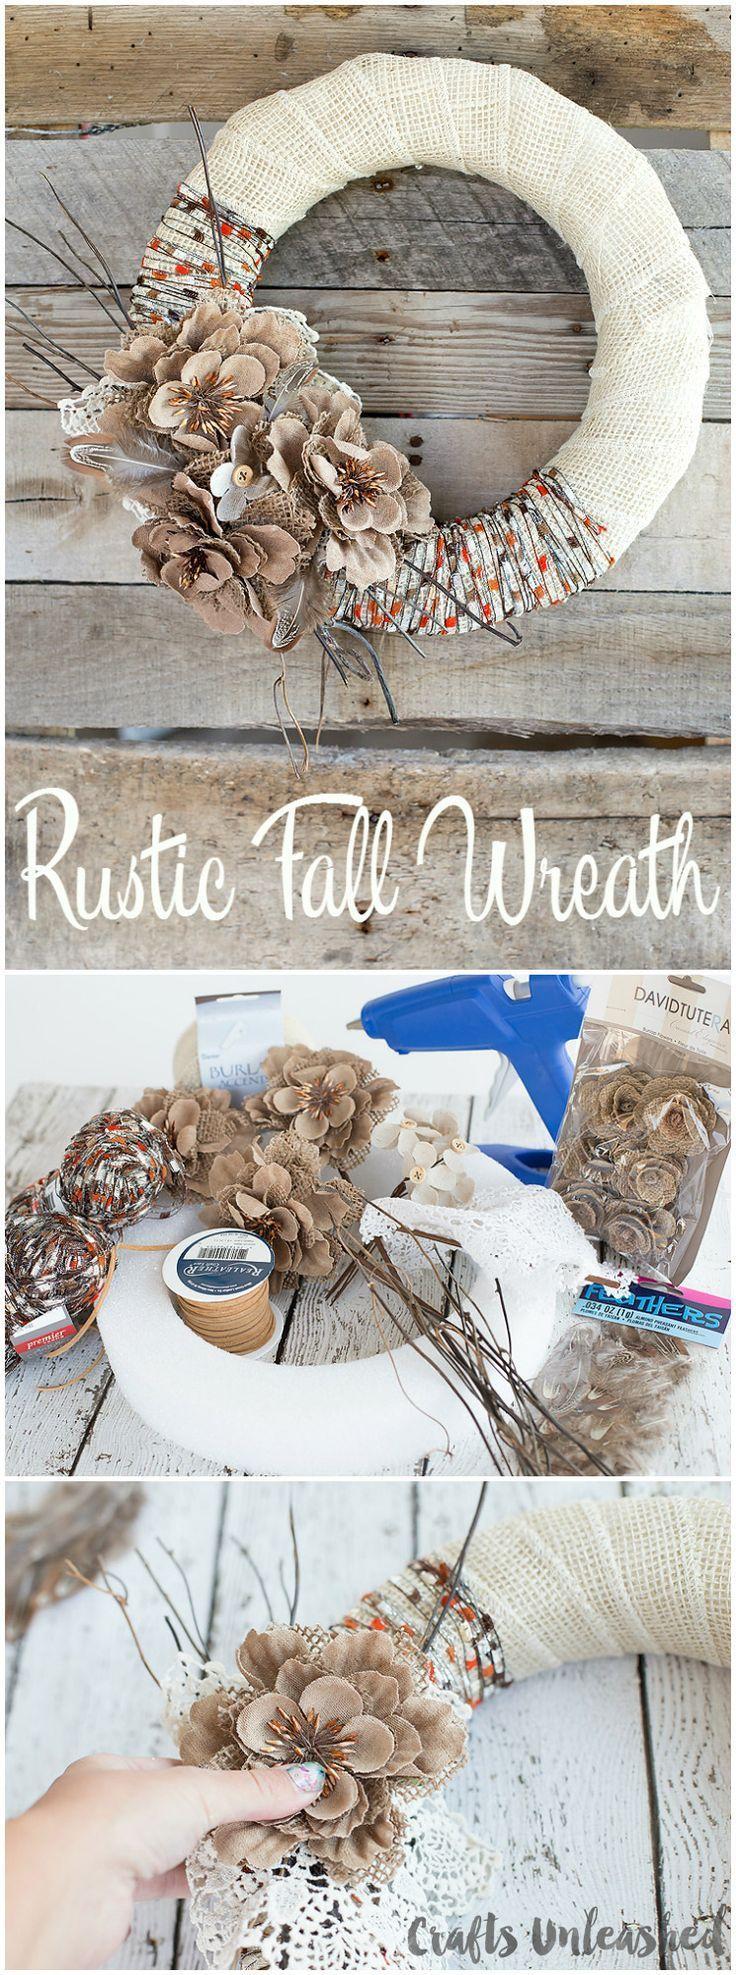 Fall Wreath DIY Project Idea: Burlap & Yarn - Consumer Crafts